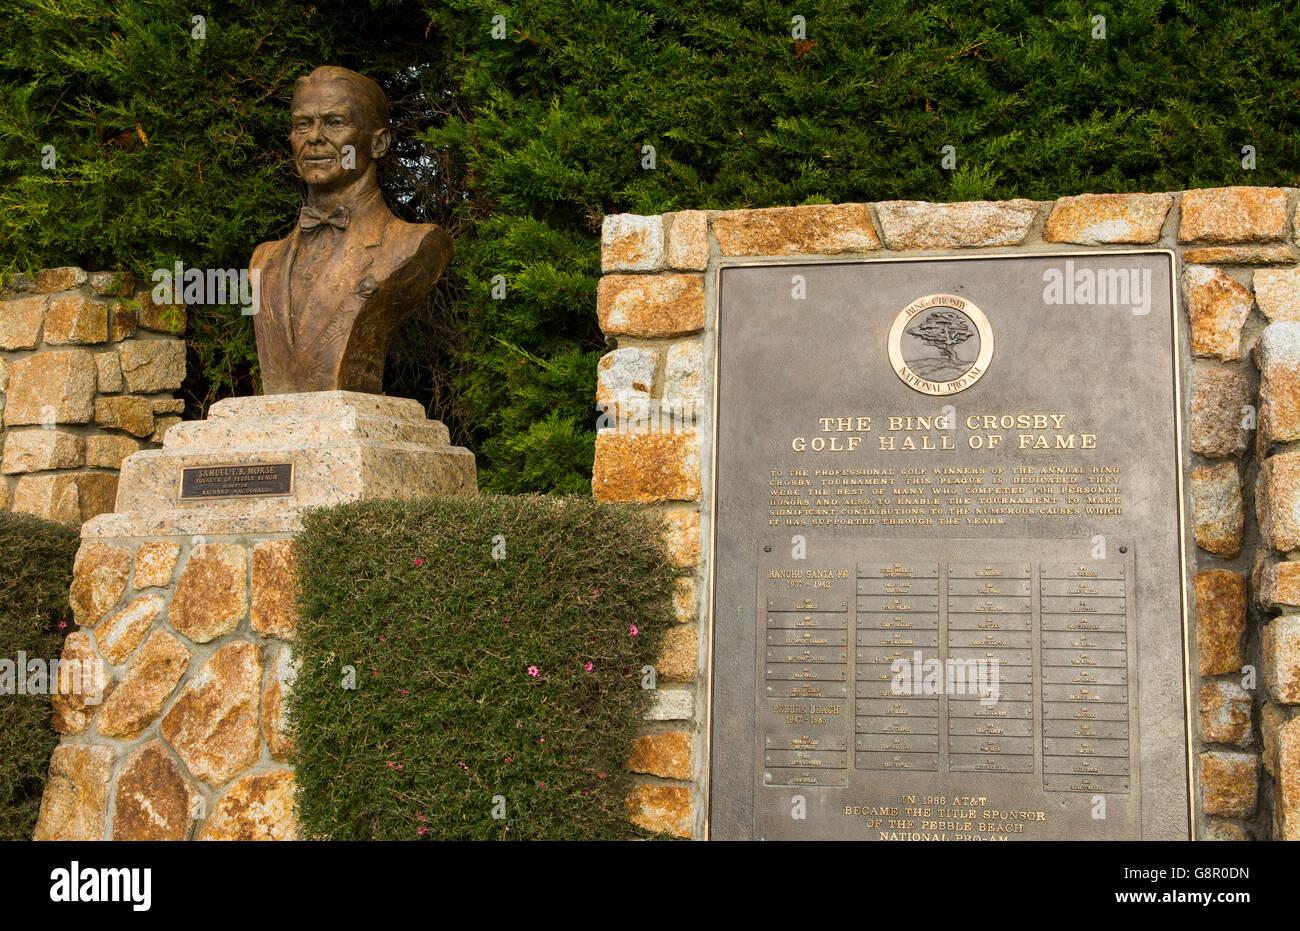 Pebble Beach California statue of Samuel F.B. Morse, founder at Pebble Beach Golf Links and list of Bing Crosby - Stock Image